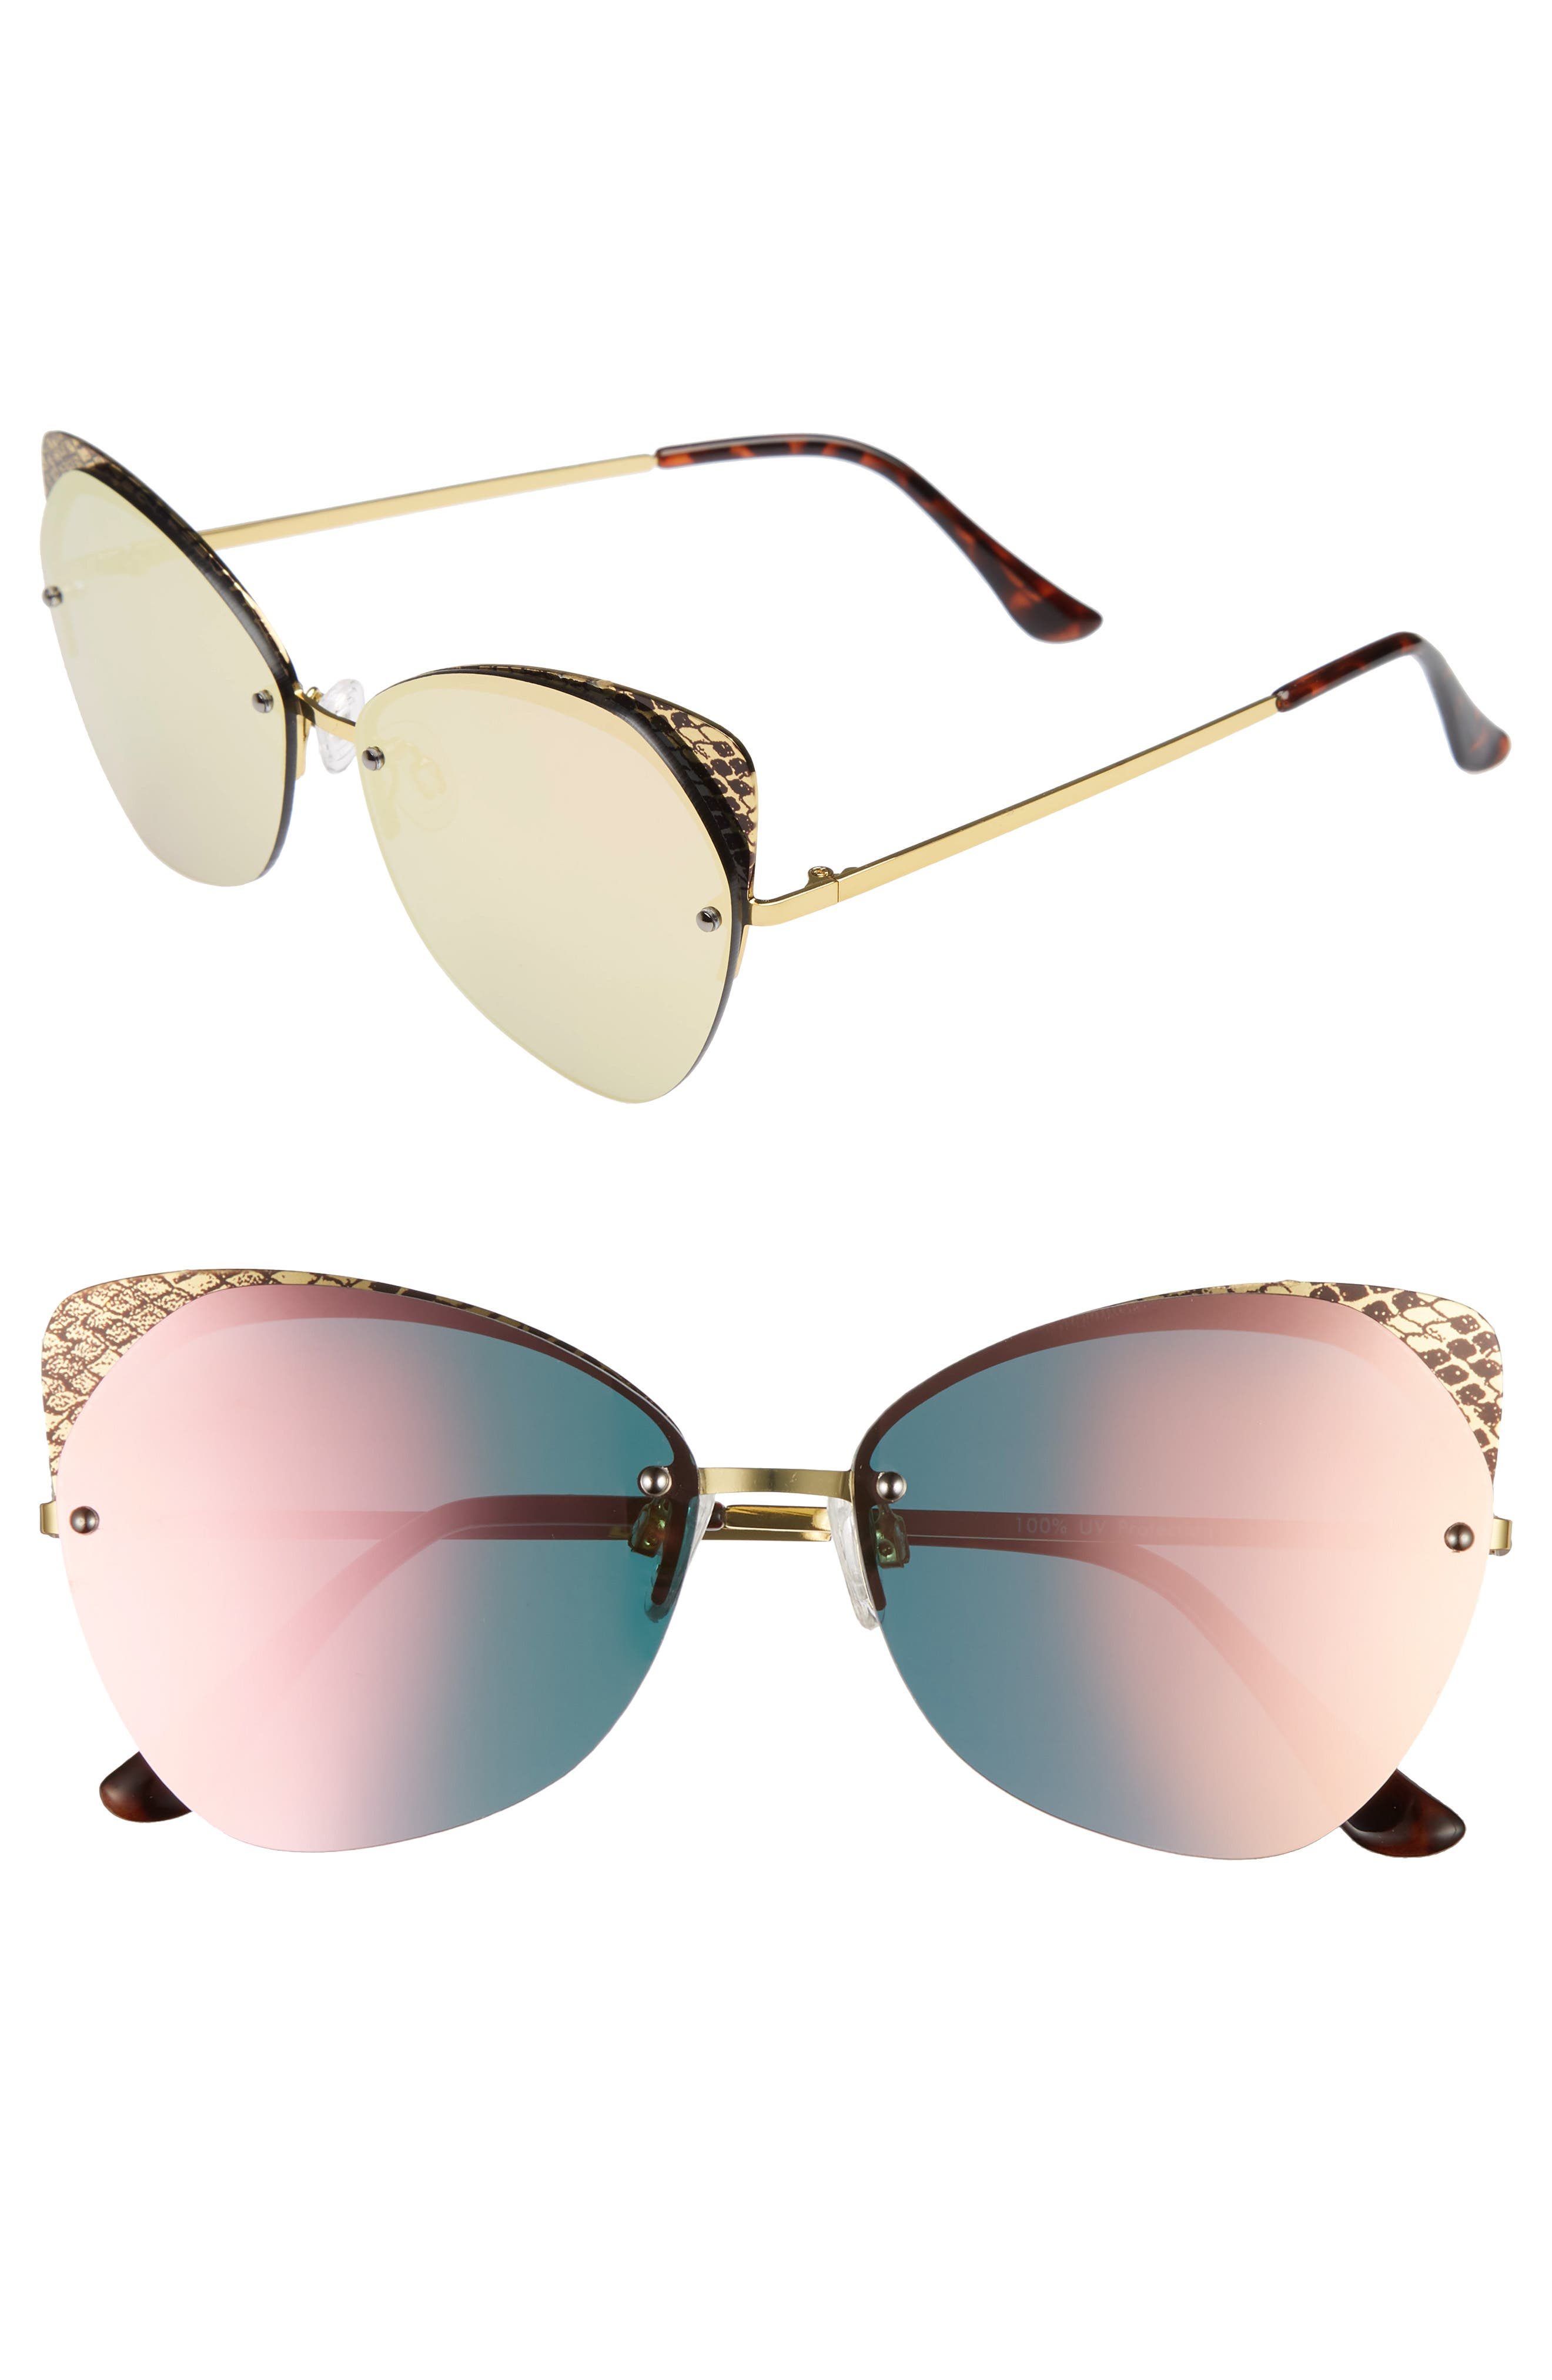 59mm Snakeskin Accent Rimless Cat Eye Sunglasses,                             Main thumbnail 1, color,                             Snake Pink